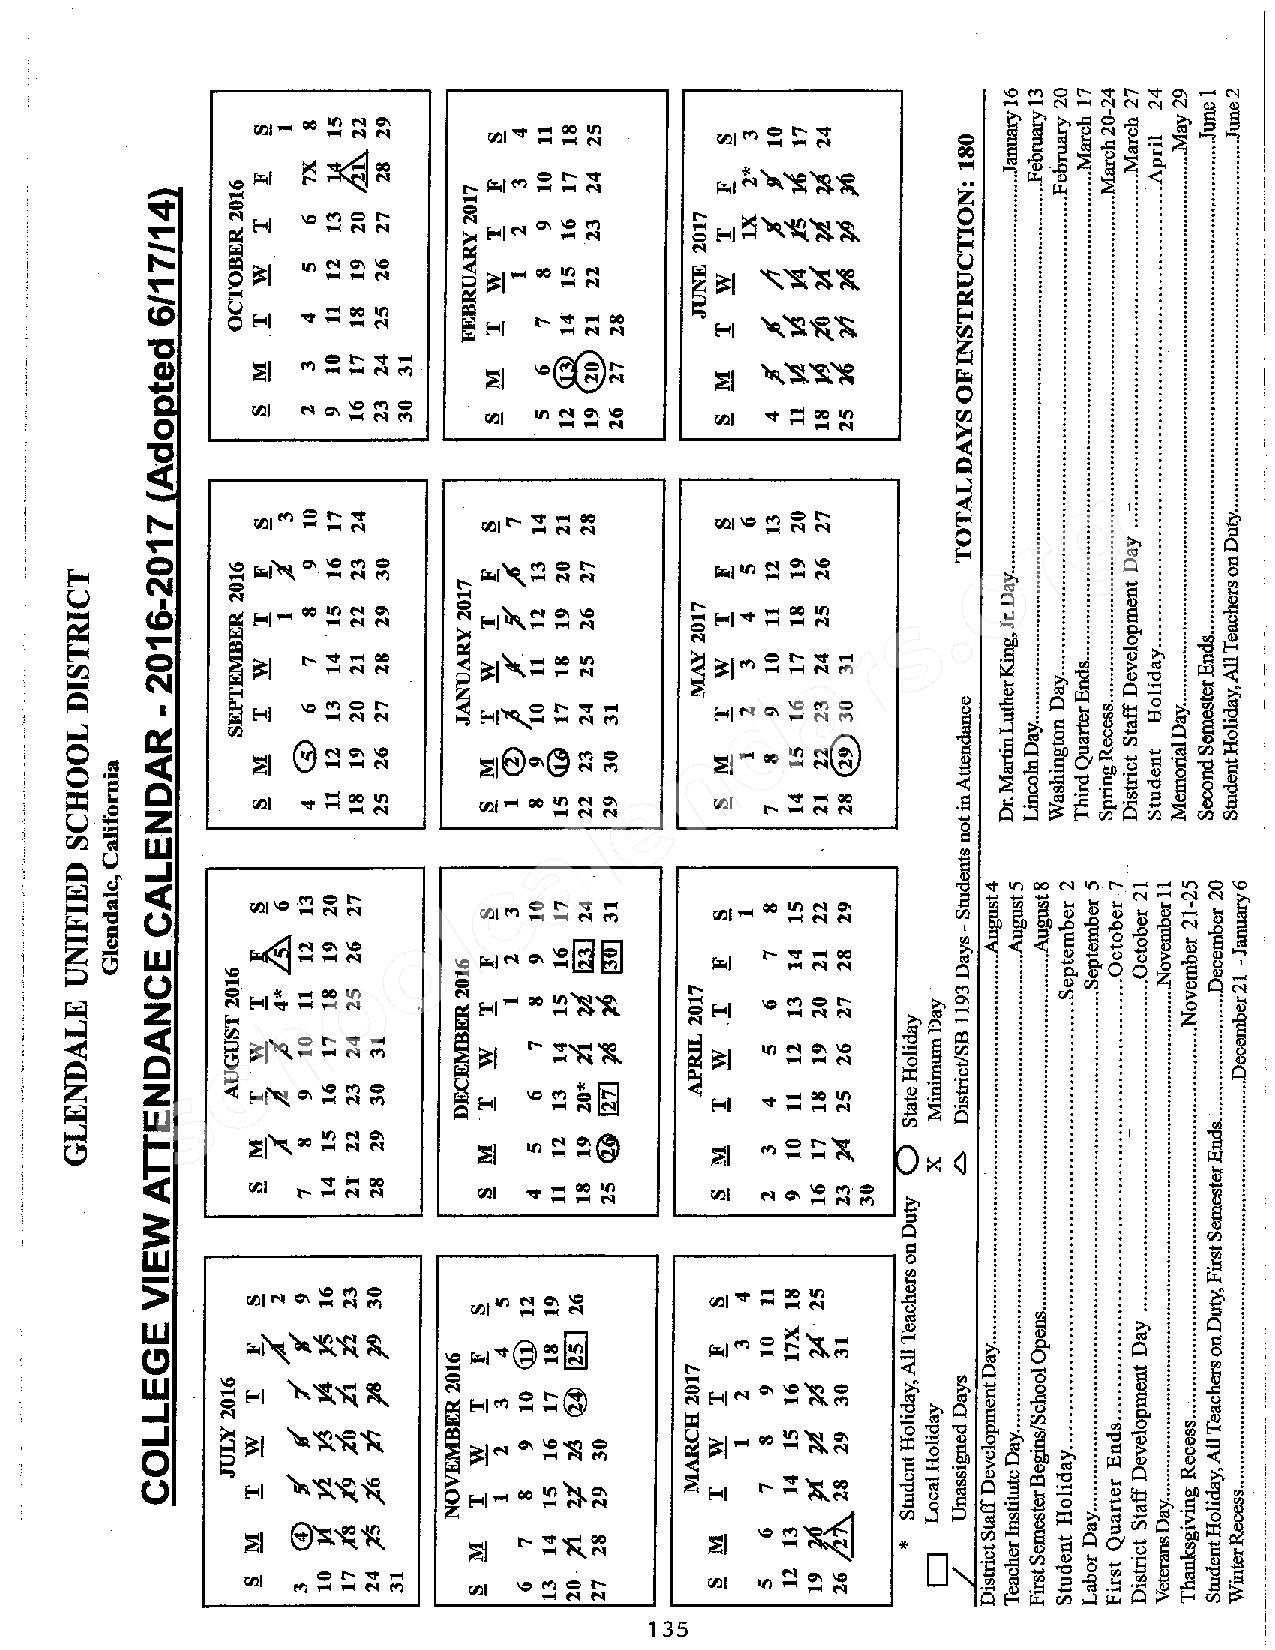 Hfd October 2021 Shift Calendar | Calendar Printables Free Blank in Calendar 2021 Zile Lucratoare